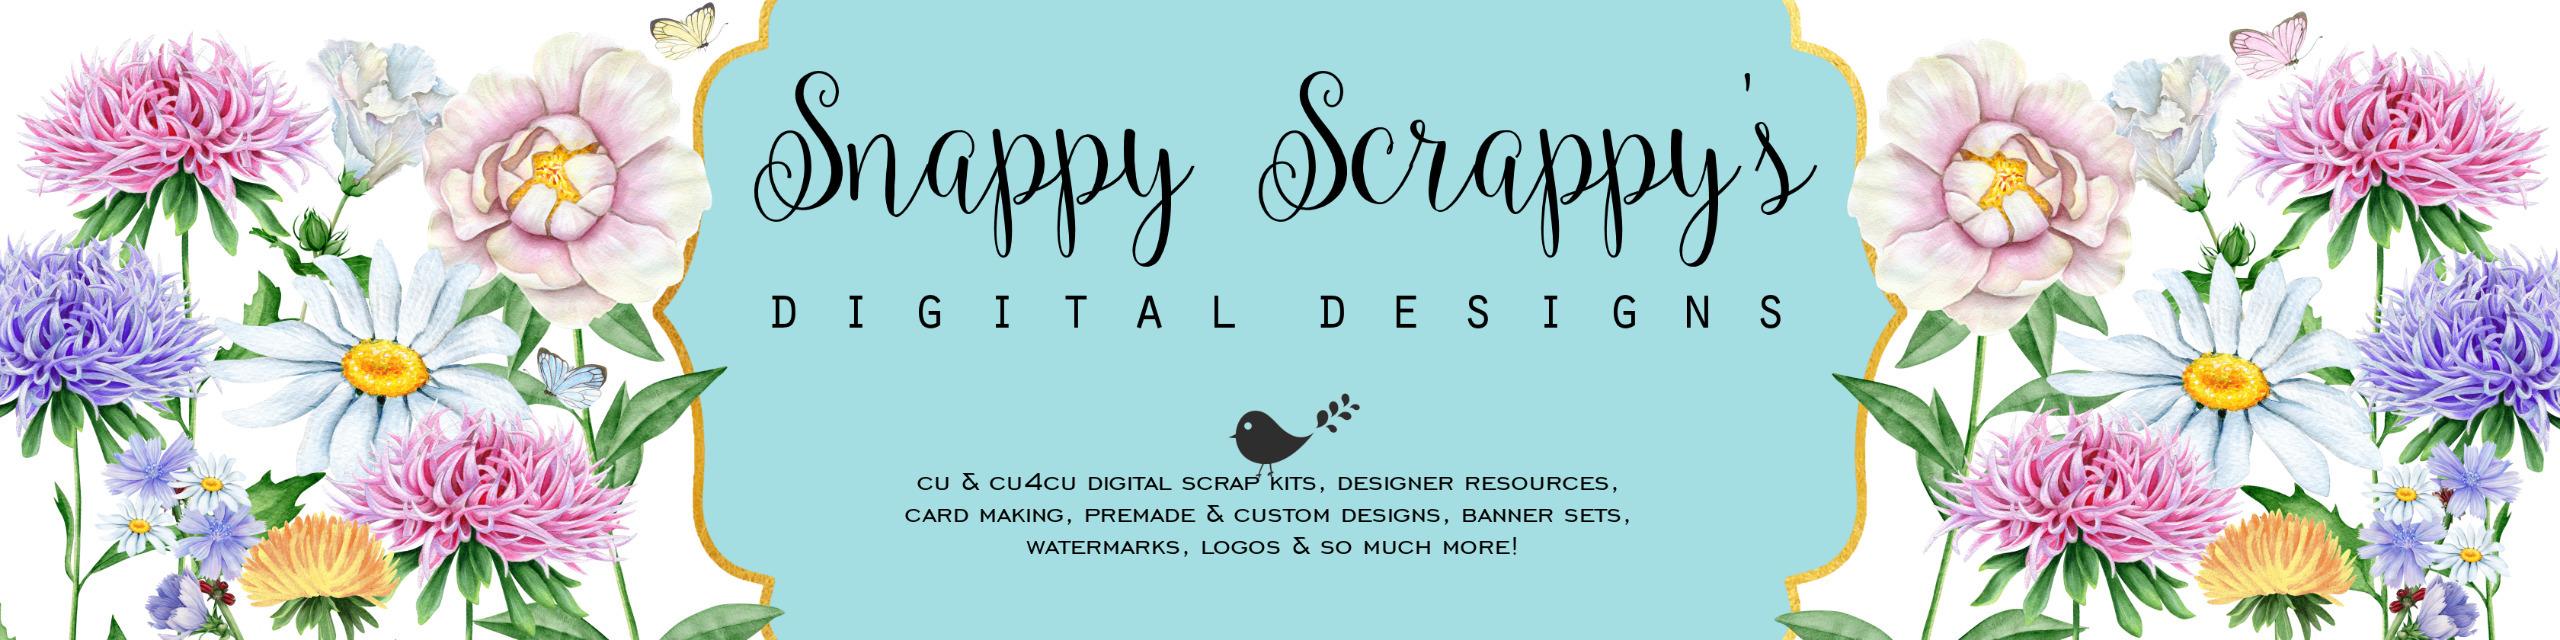 Snappyscrappy Digital Designs (@snappymarie) Cover Image